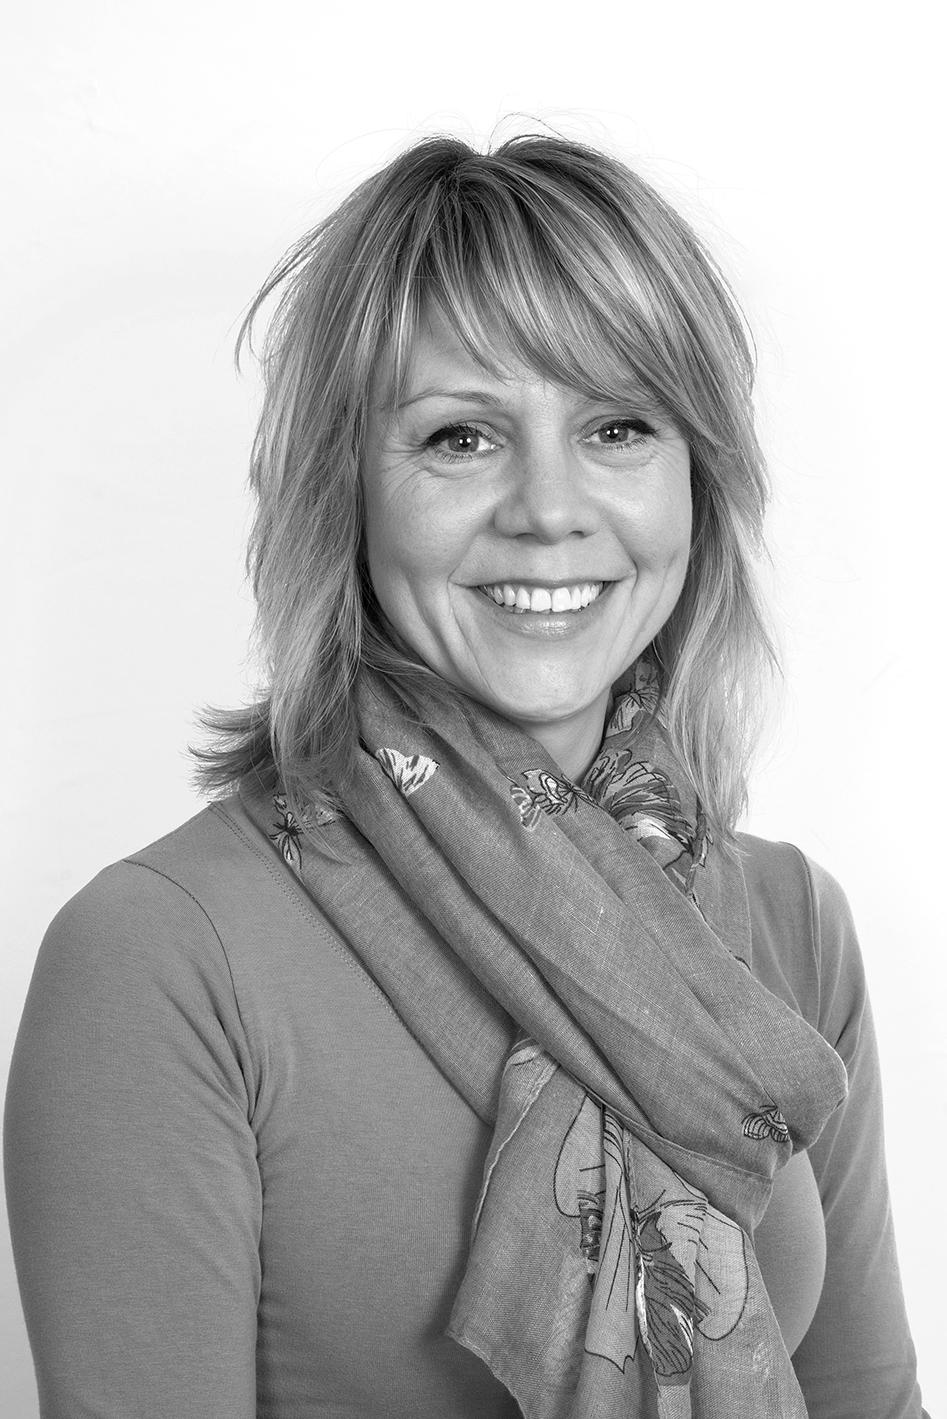 Nicola Etherington